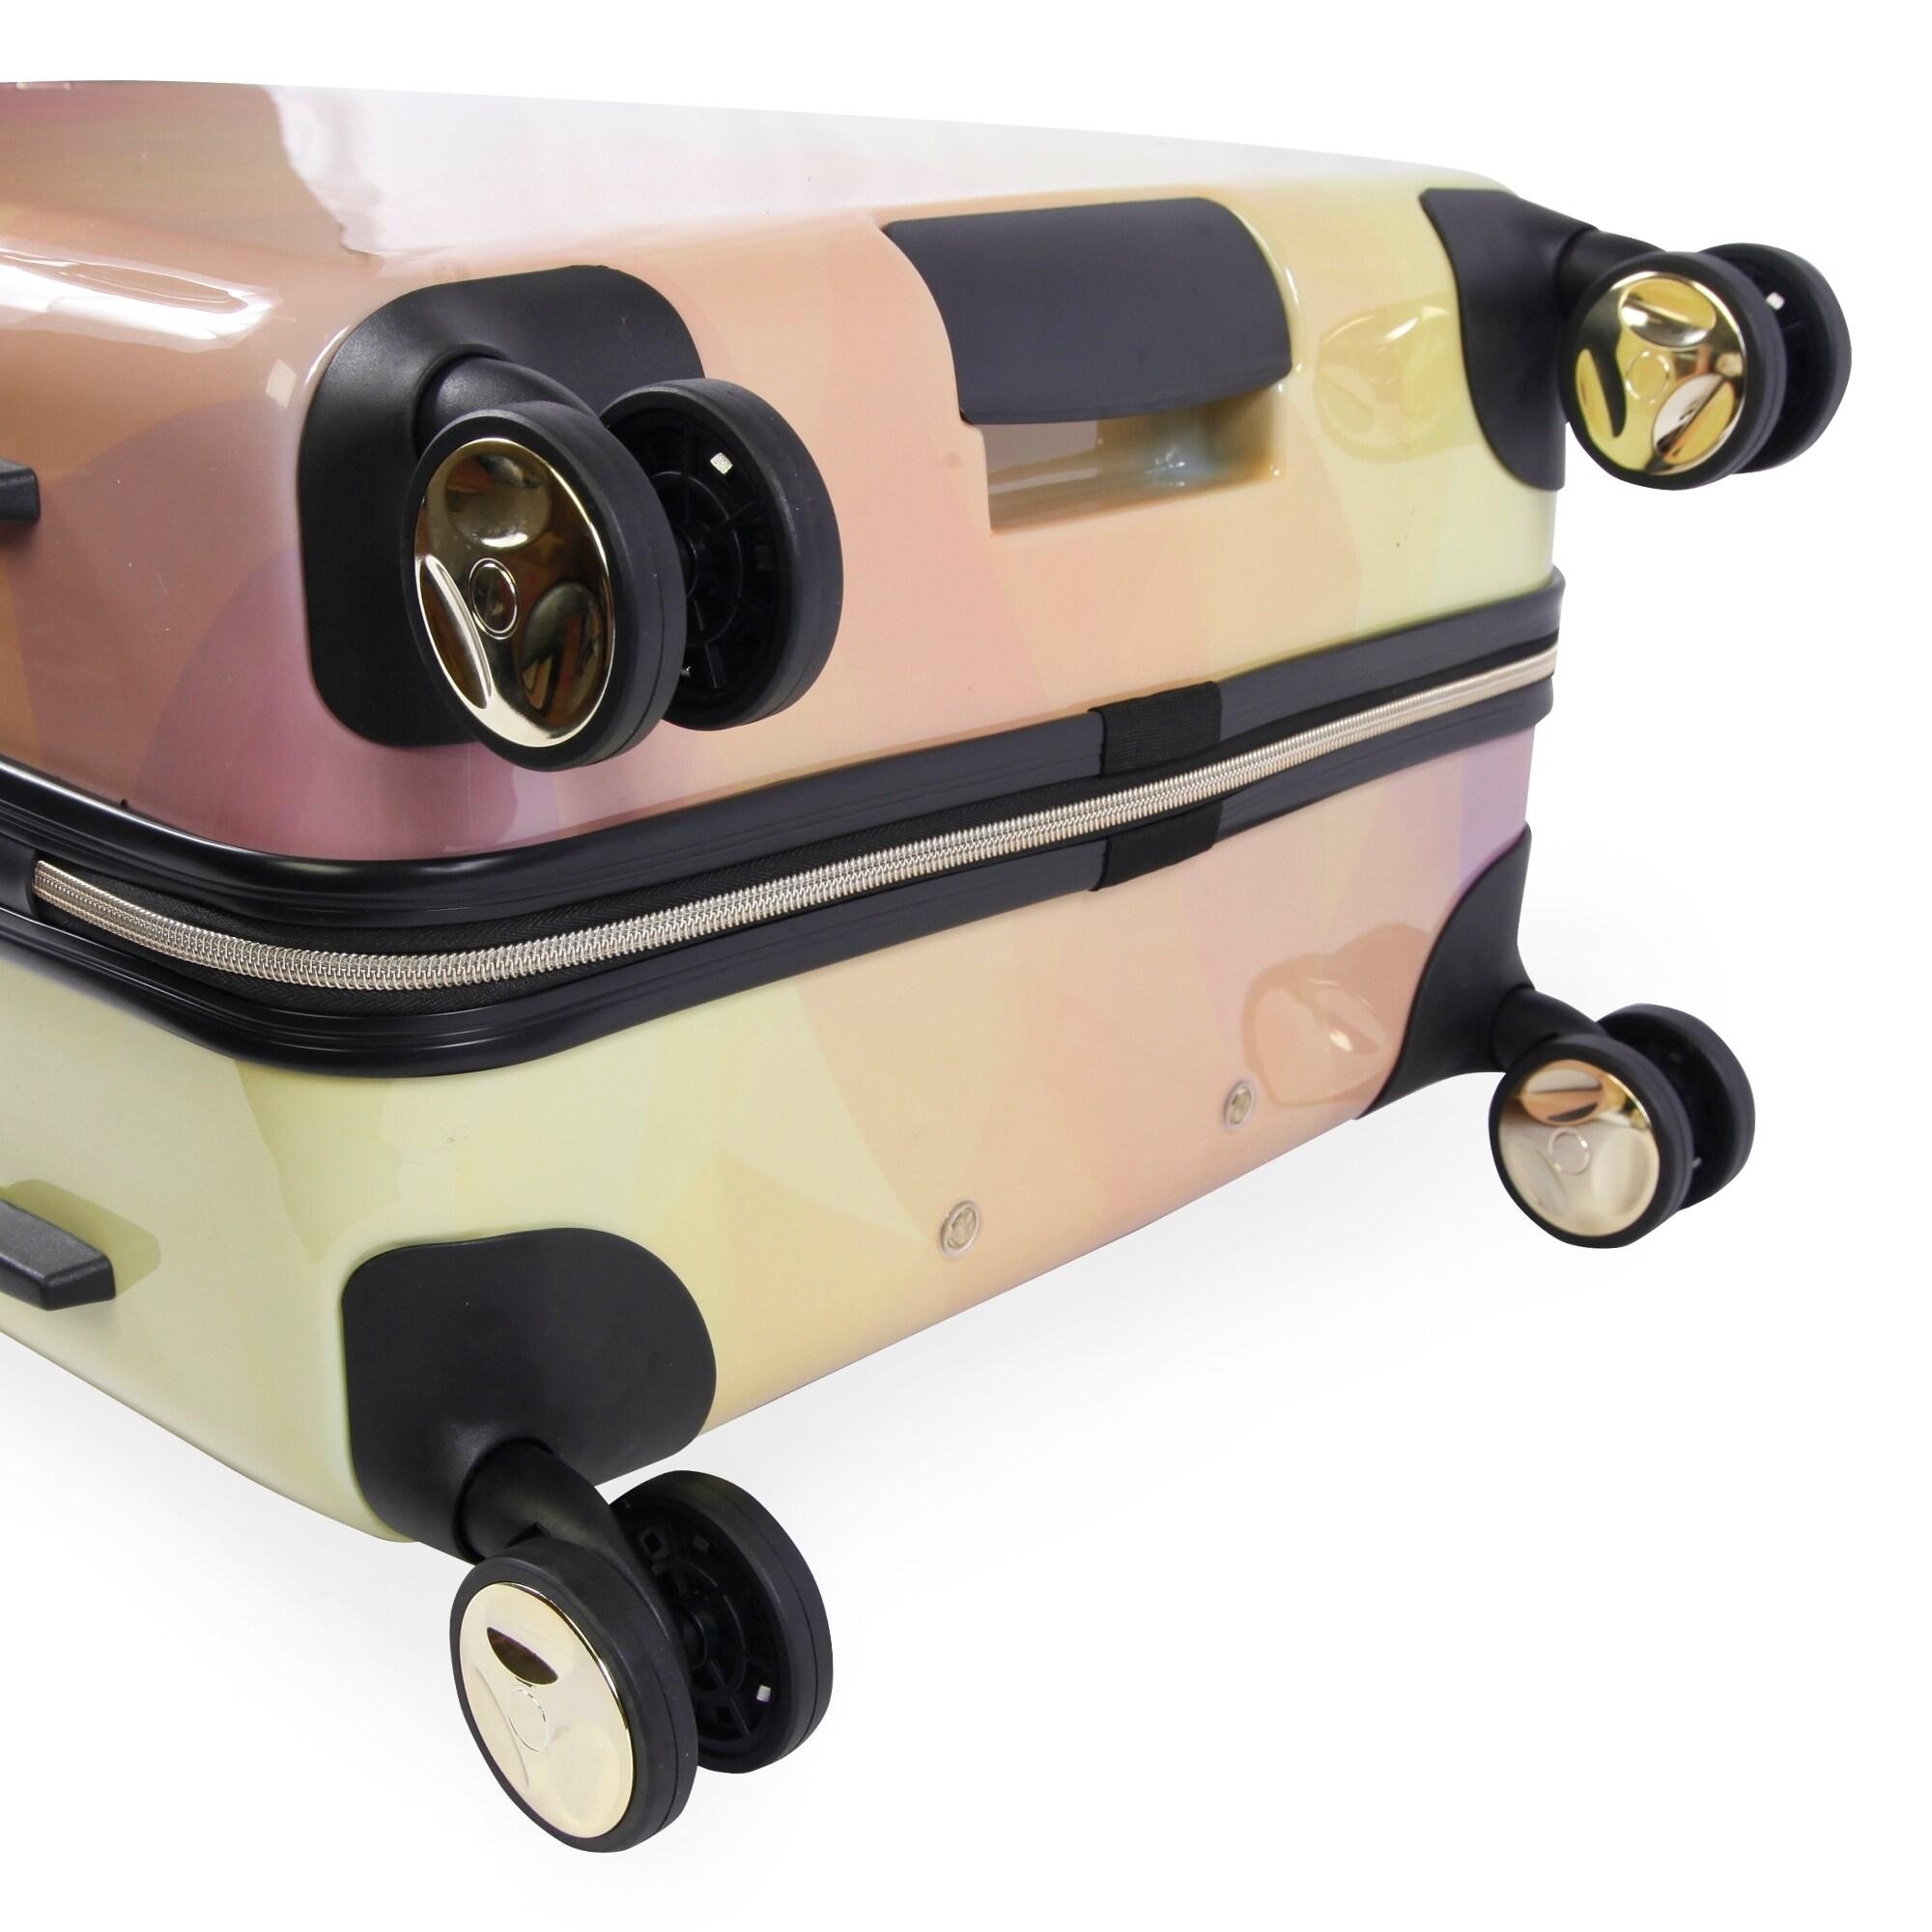 0349e966511 Shop Bebe Emma 3-pc Hardside Spinner Luggage Set - Free Shipping Today -  Overstock - 24266111